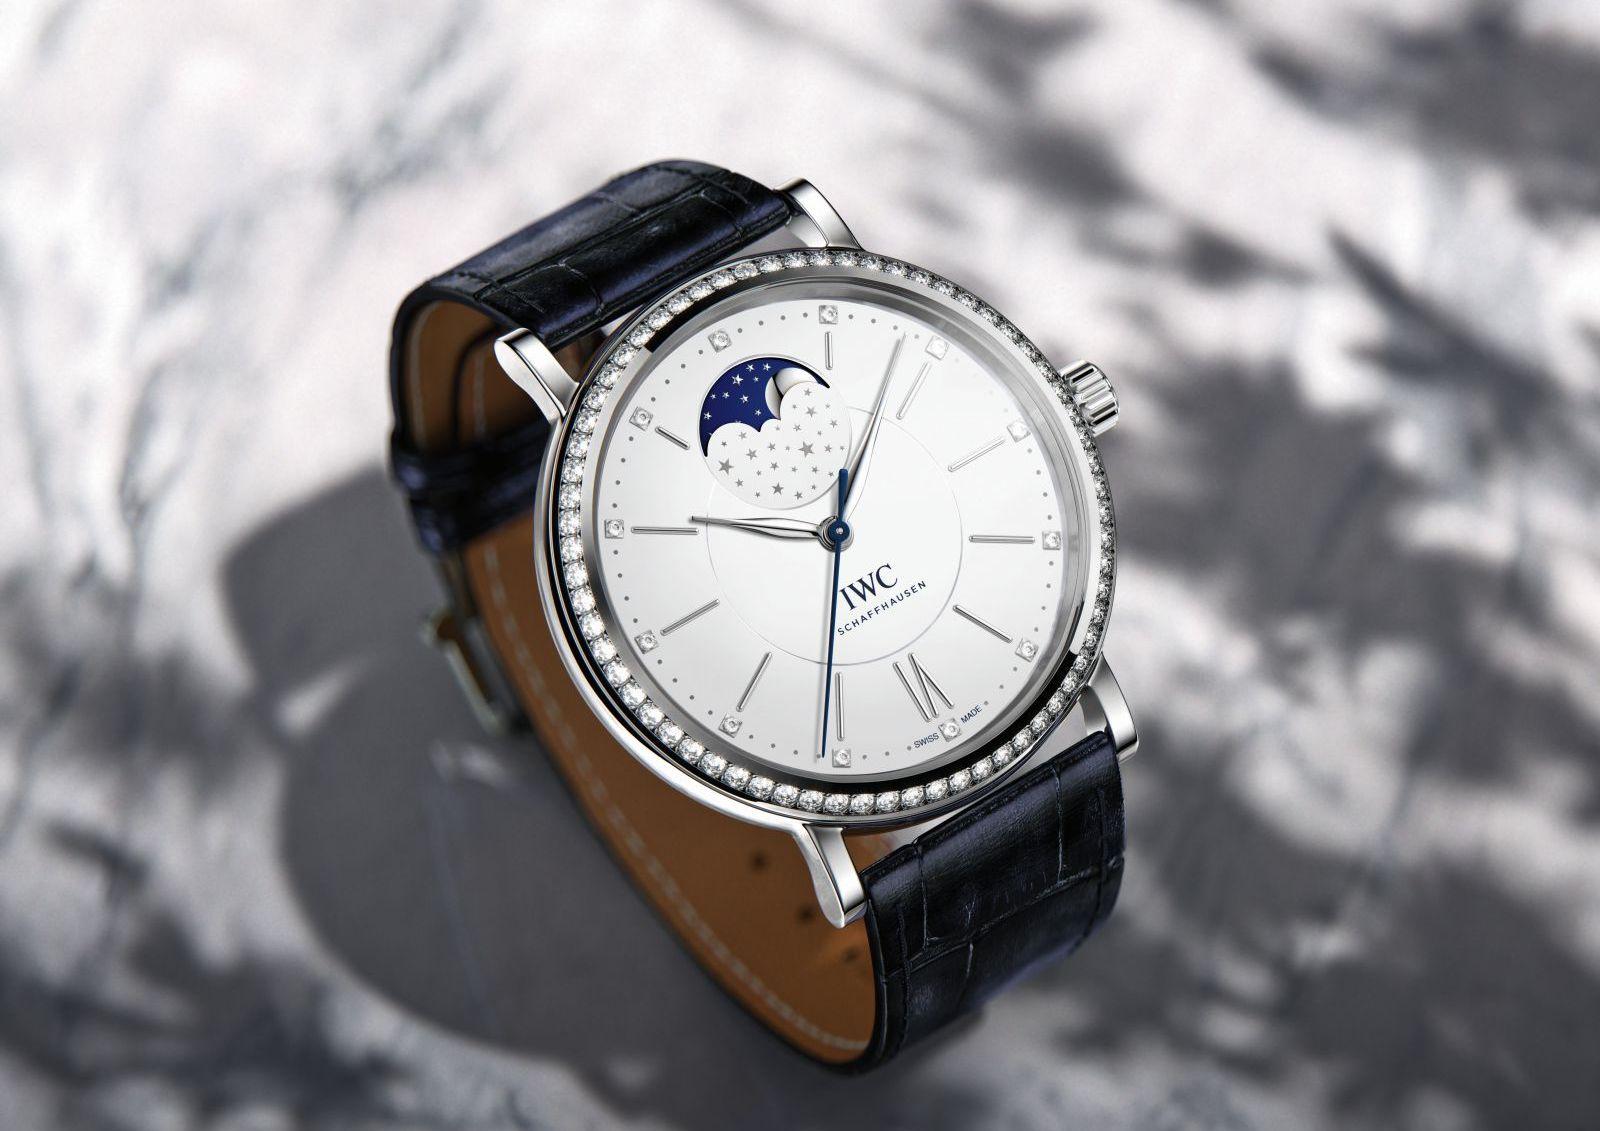 đồng hồ IWC Portofino Moon Phase